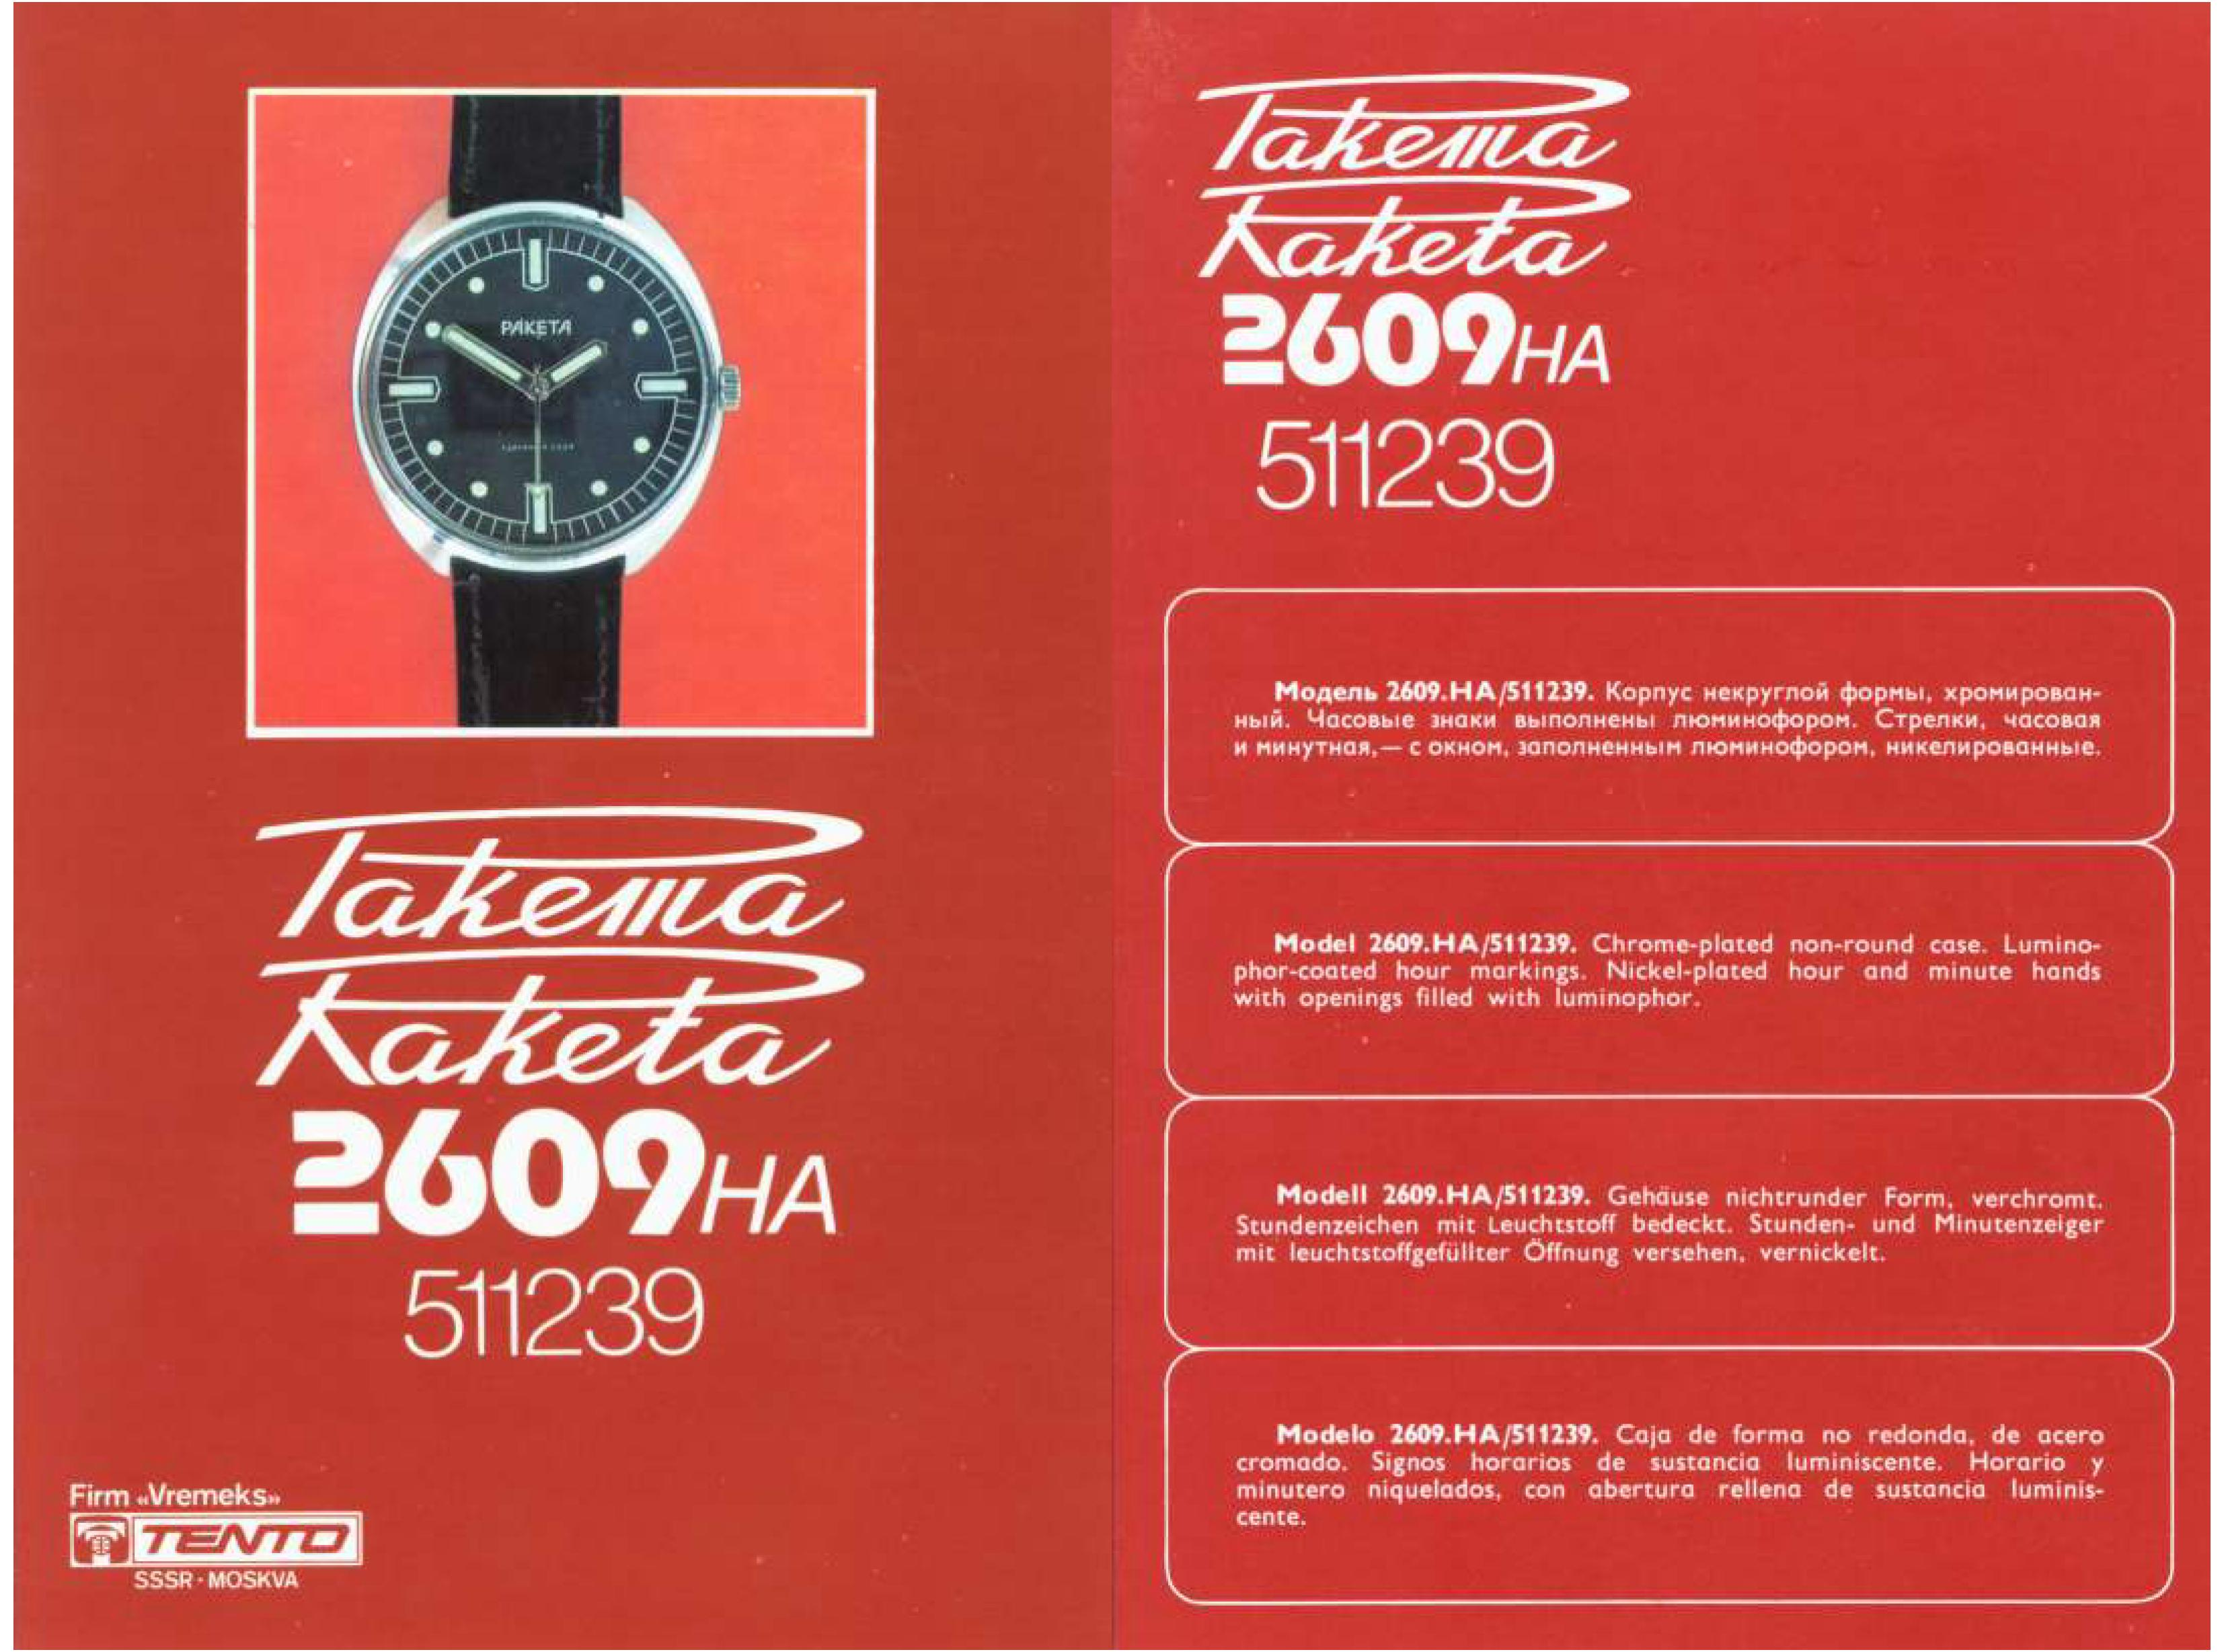 Name:  Raketa-by-m-watches-2609_1_20_09.jpg Views: 2222 Size:  593.6 KB